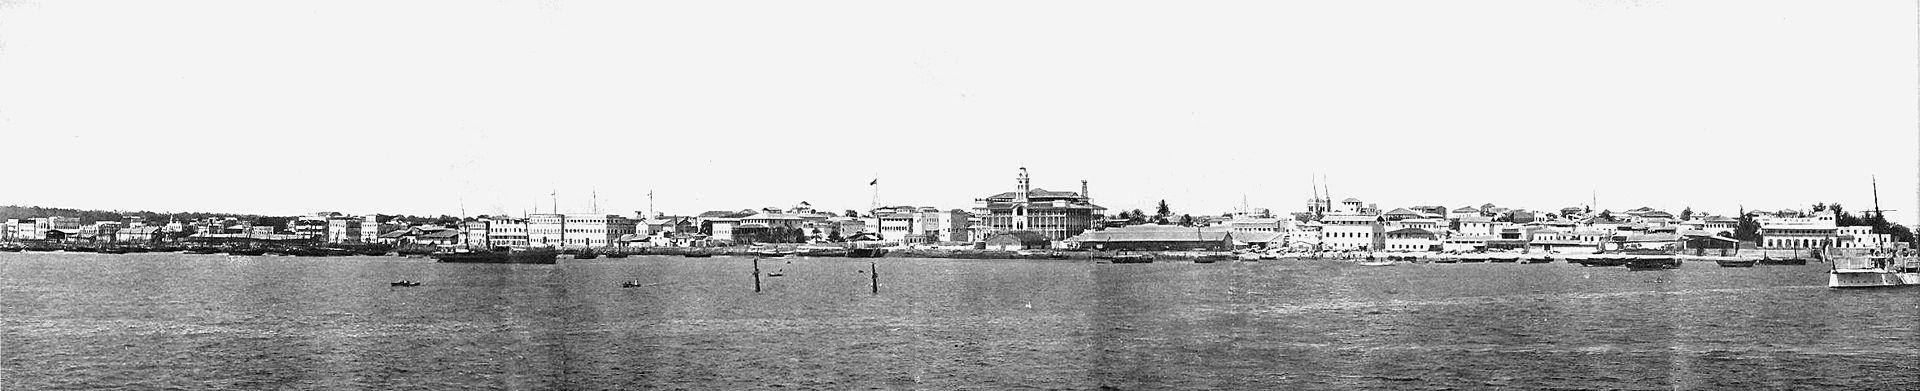 a_c_gomes_panorama_zanzibar_1902.jpg